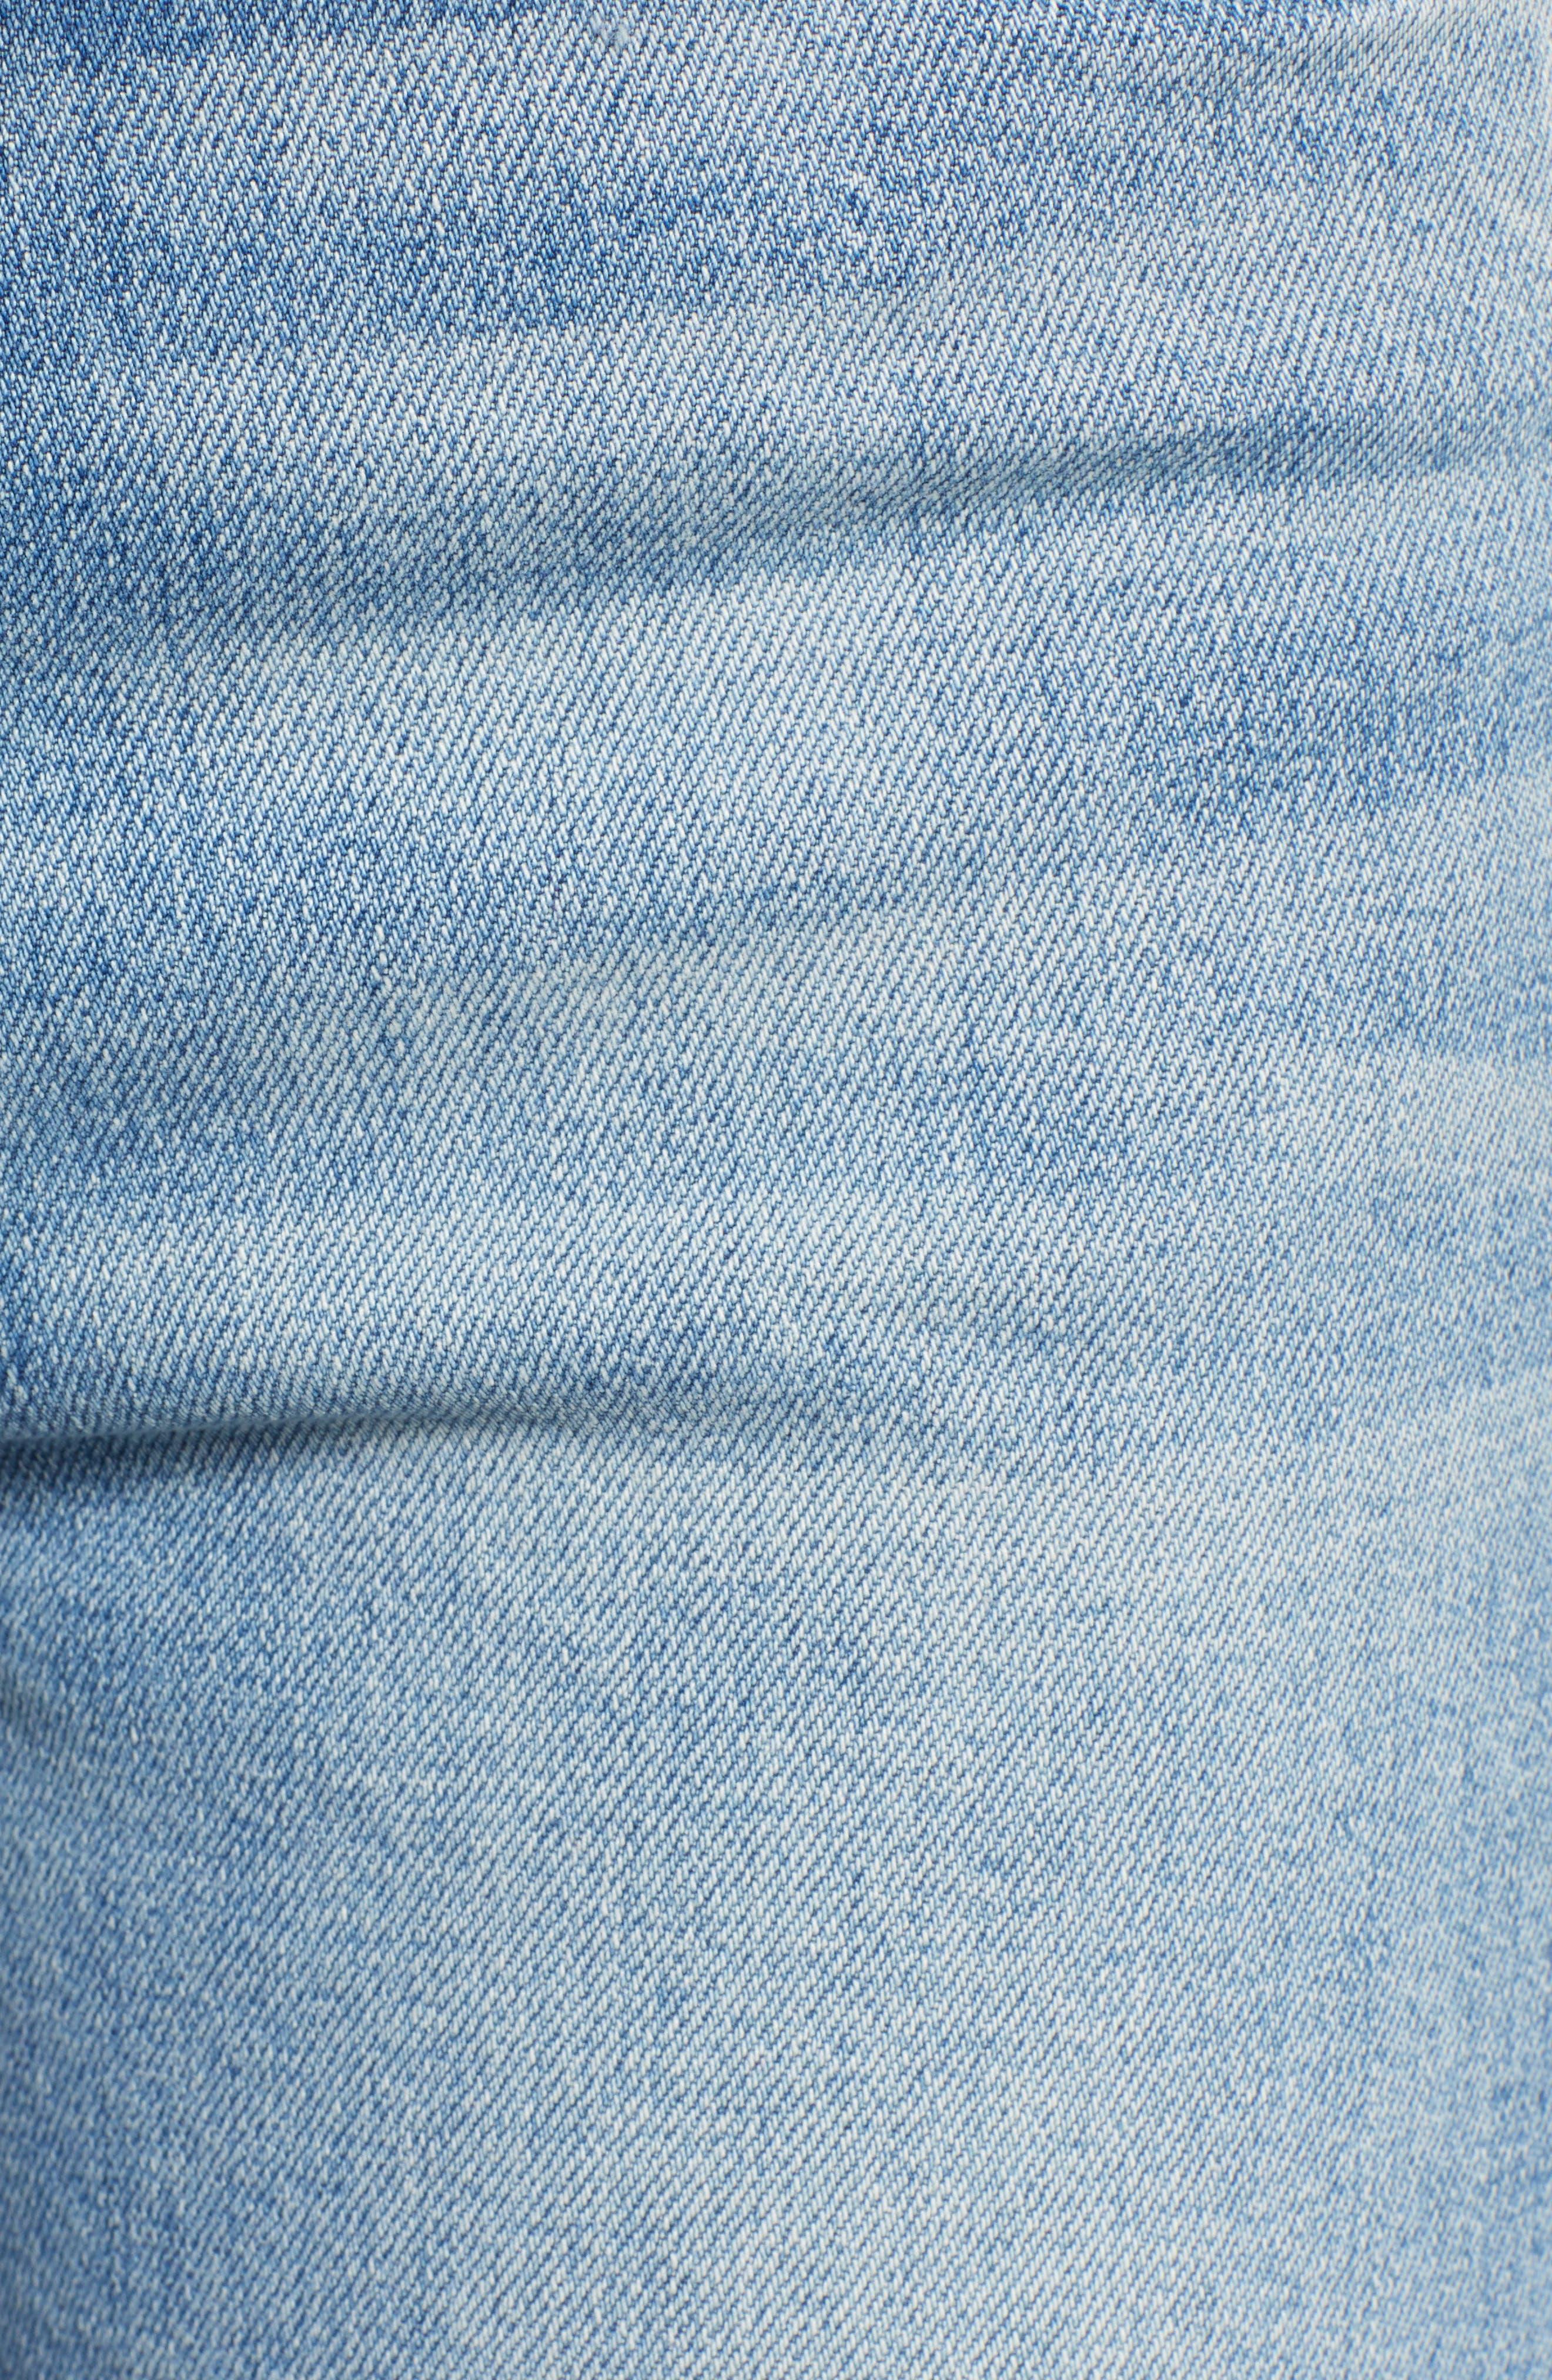 Tomcat Roller Chew Hem Jeans,                             Alternate thumbnail 6, color,                             420